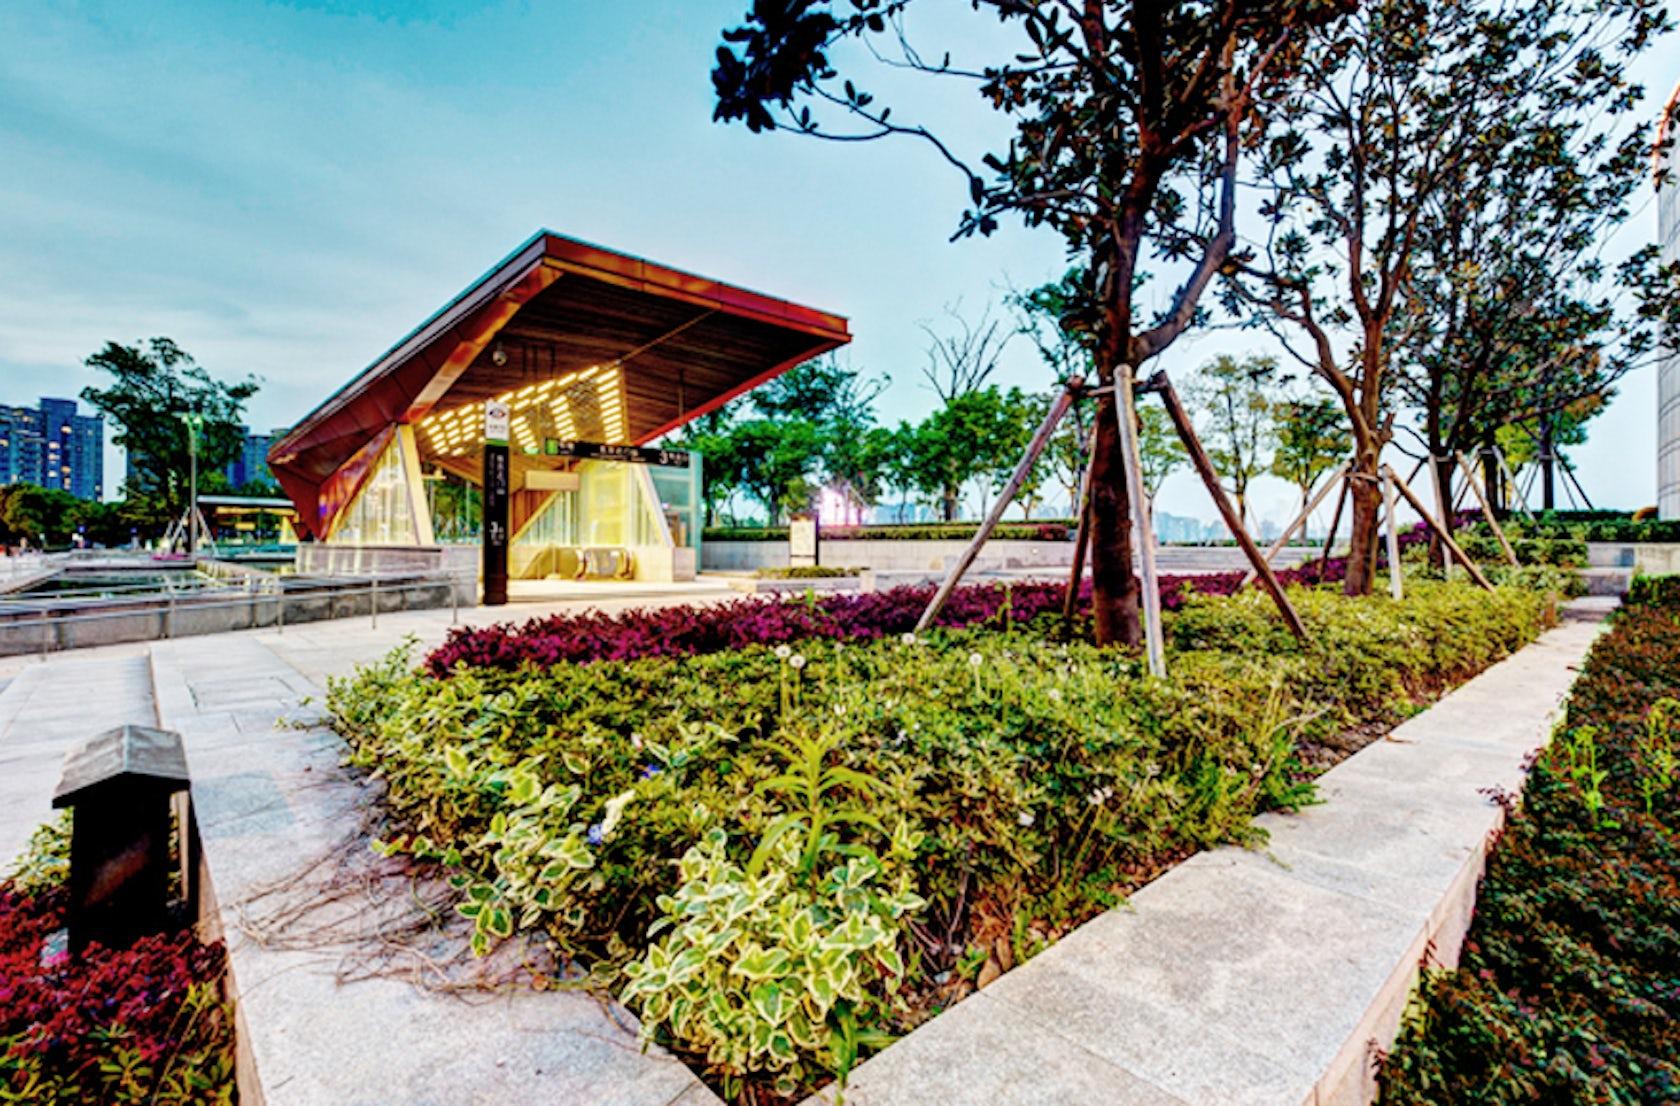 Suzhou jinji lake mtr architizer for Mtr landscape architects